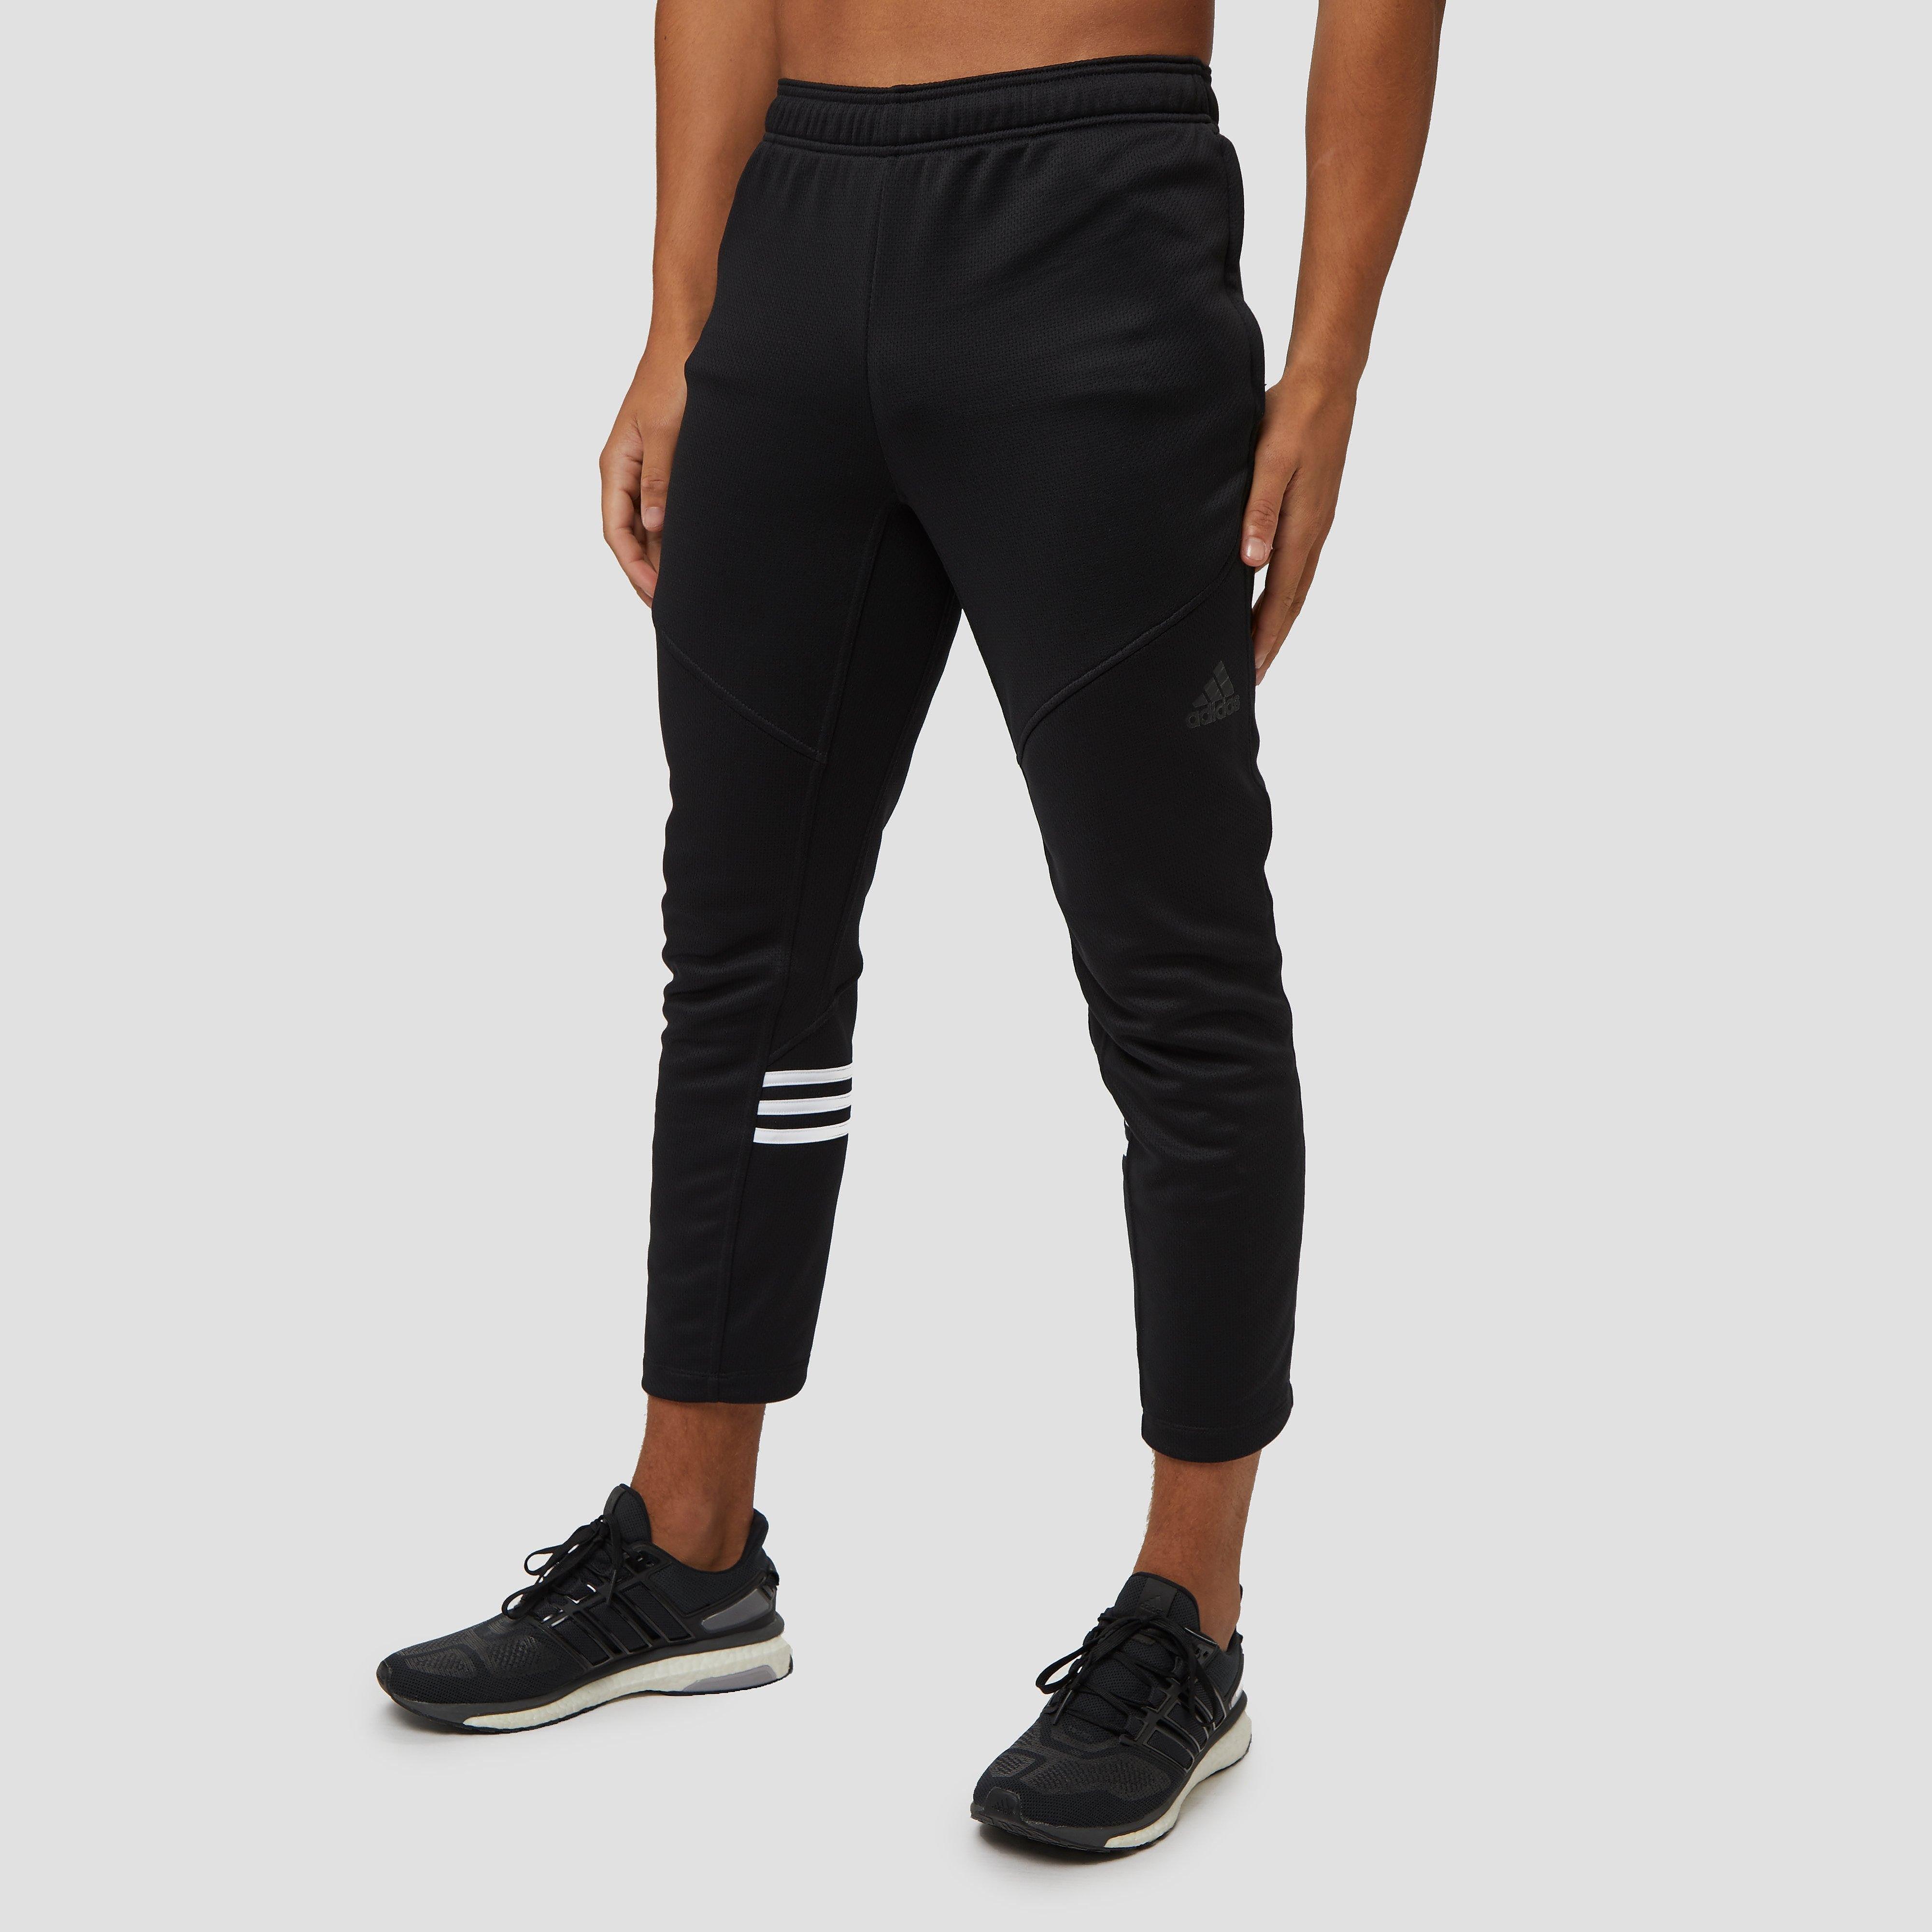 Adidas Online adidas Daily 3 stripes sportbroek zwart